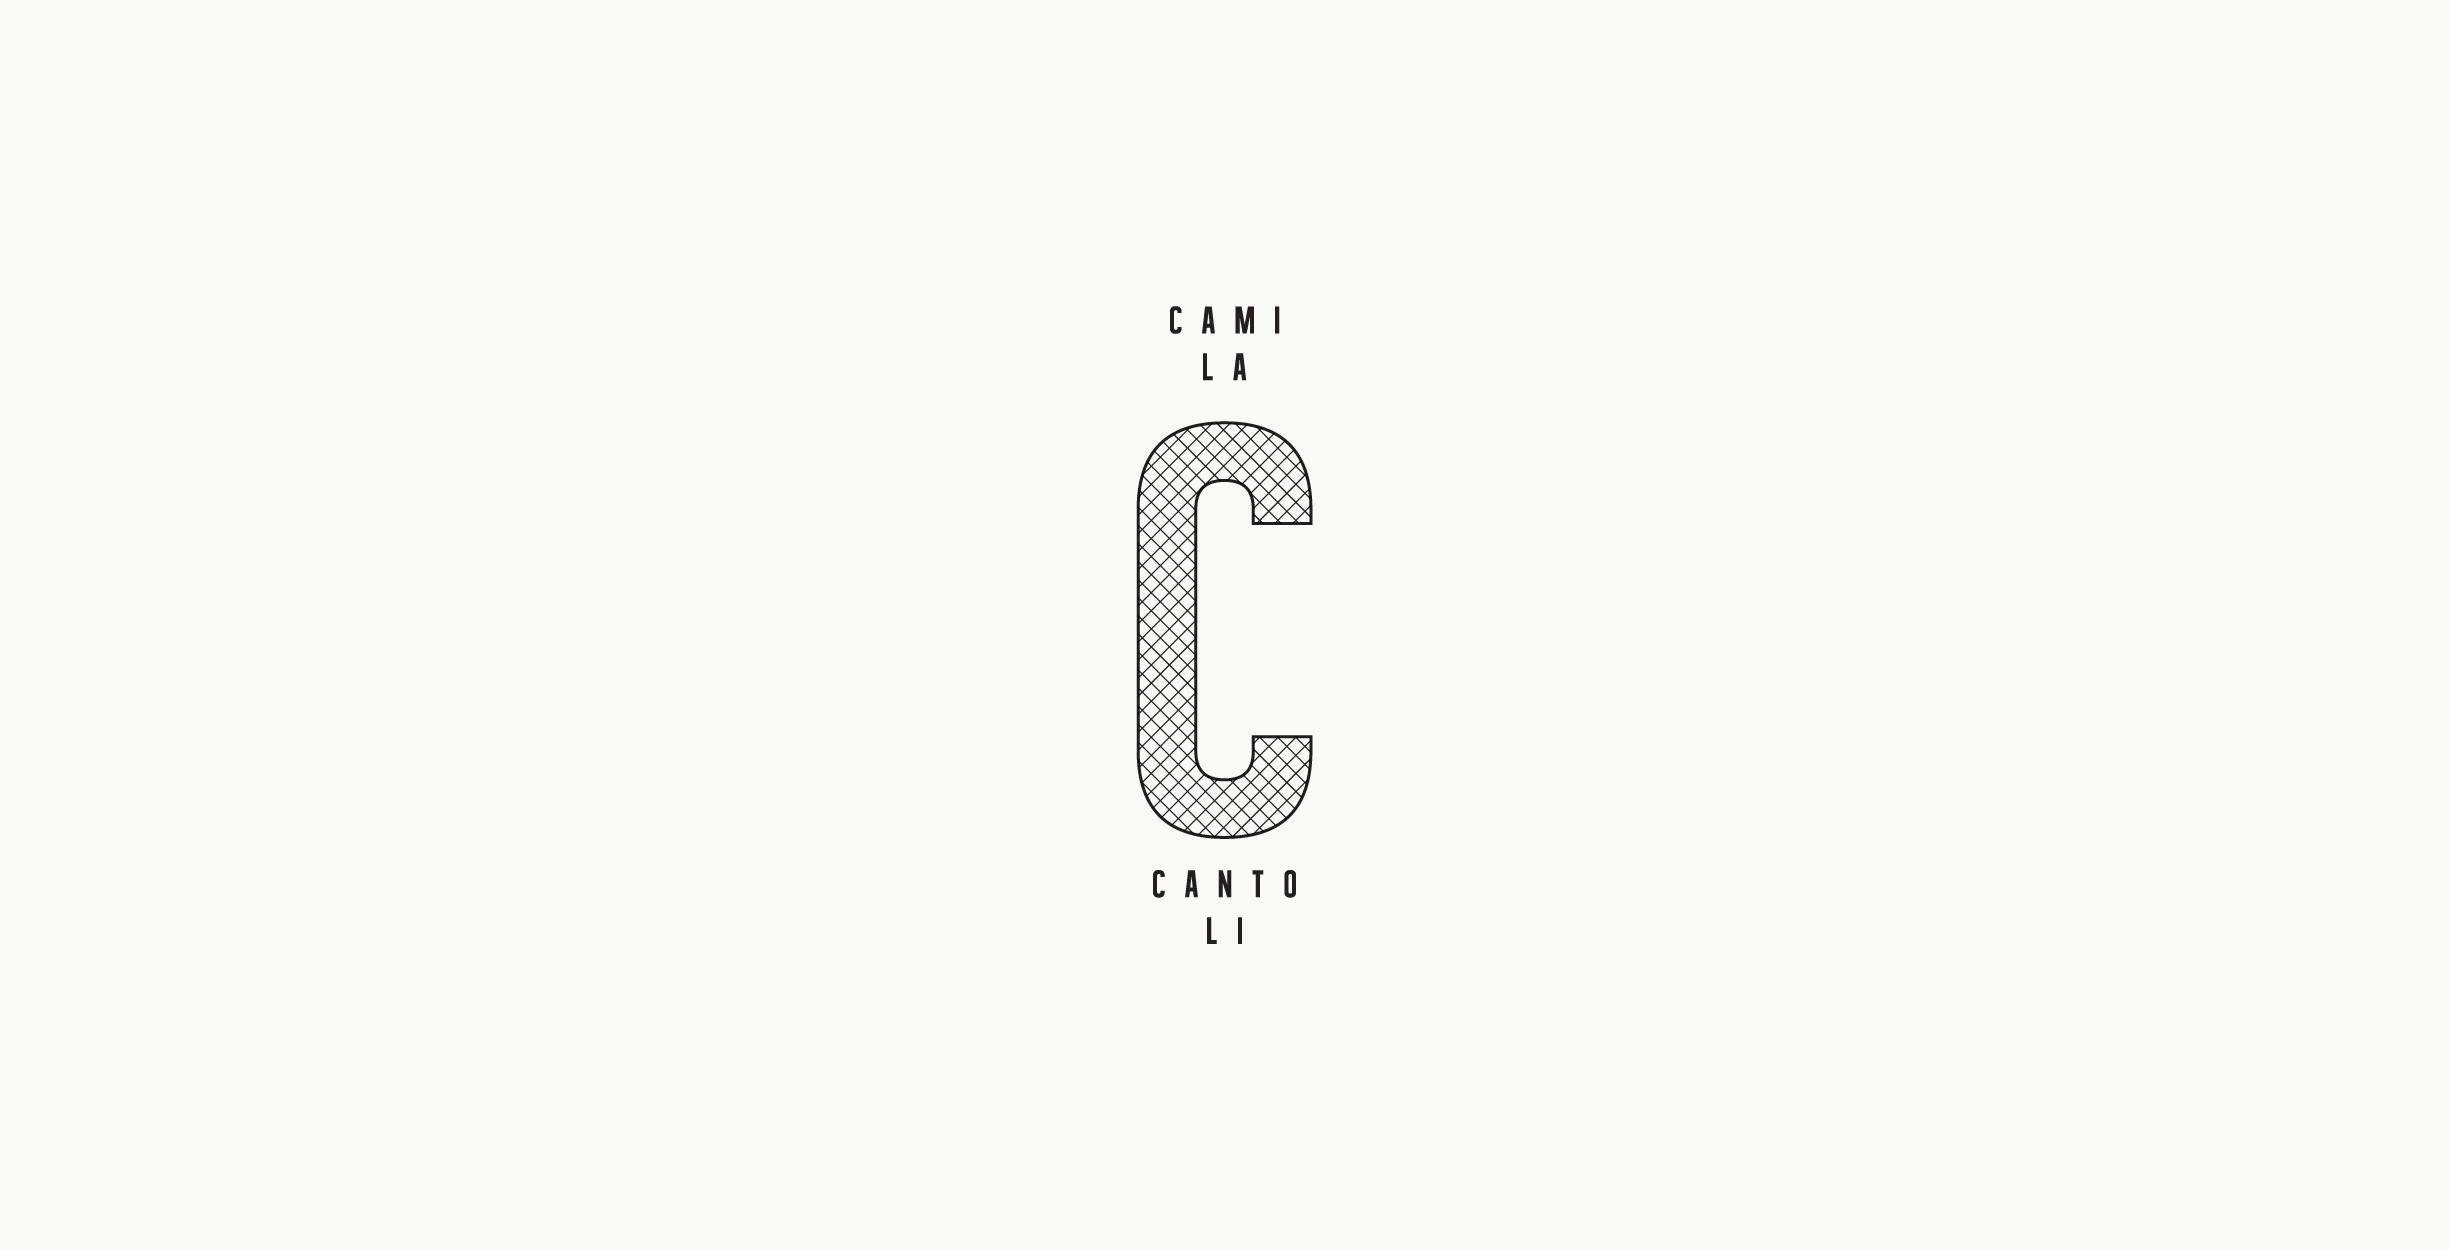 logos-2-v4-23